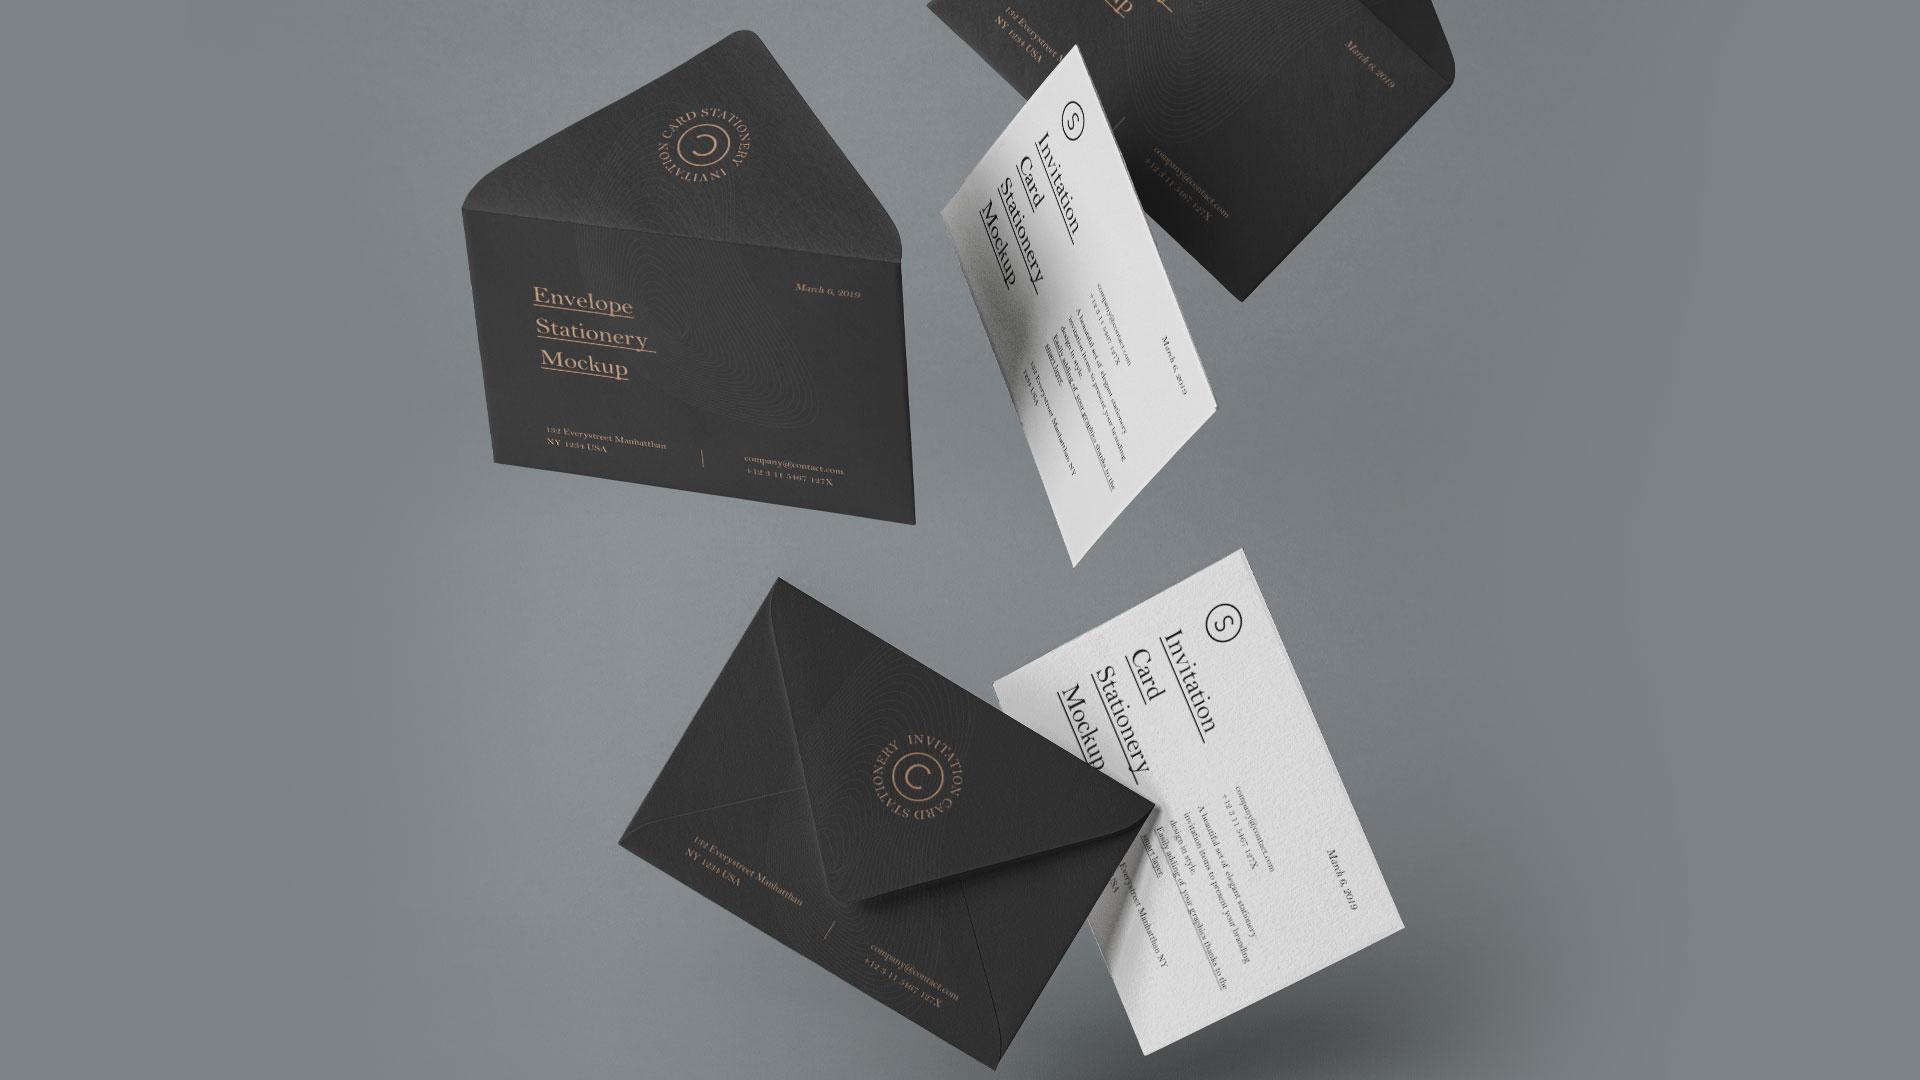 Kuvertdruck